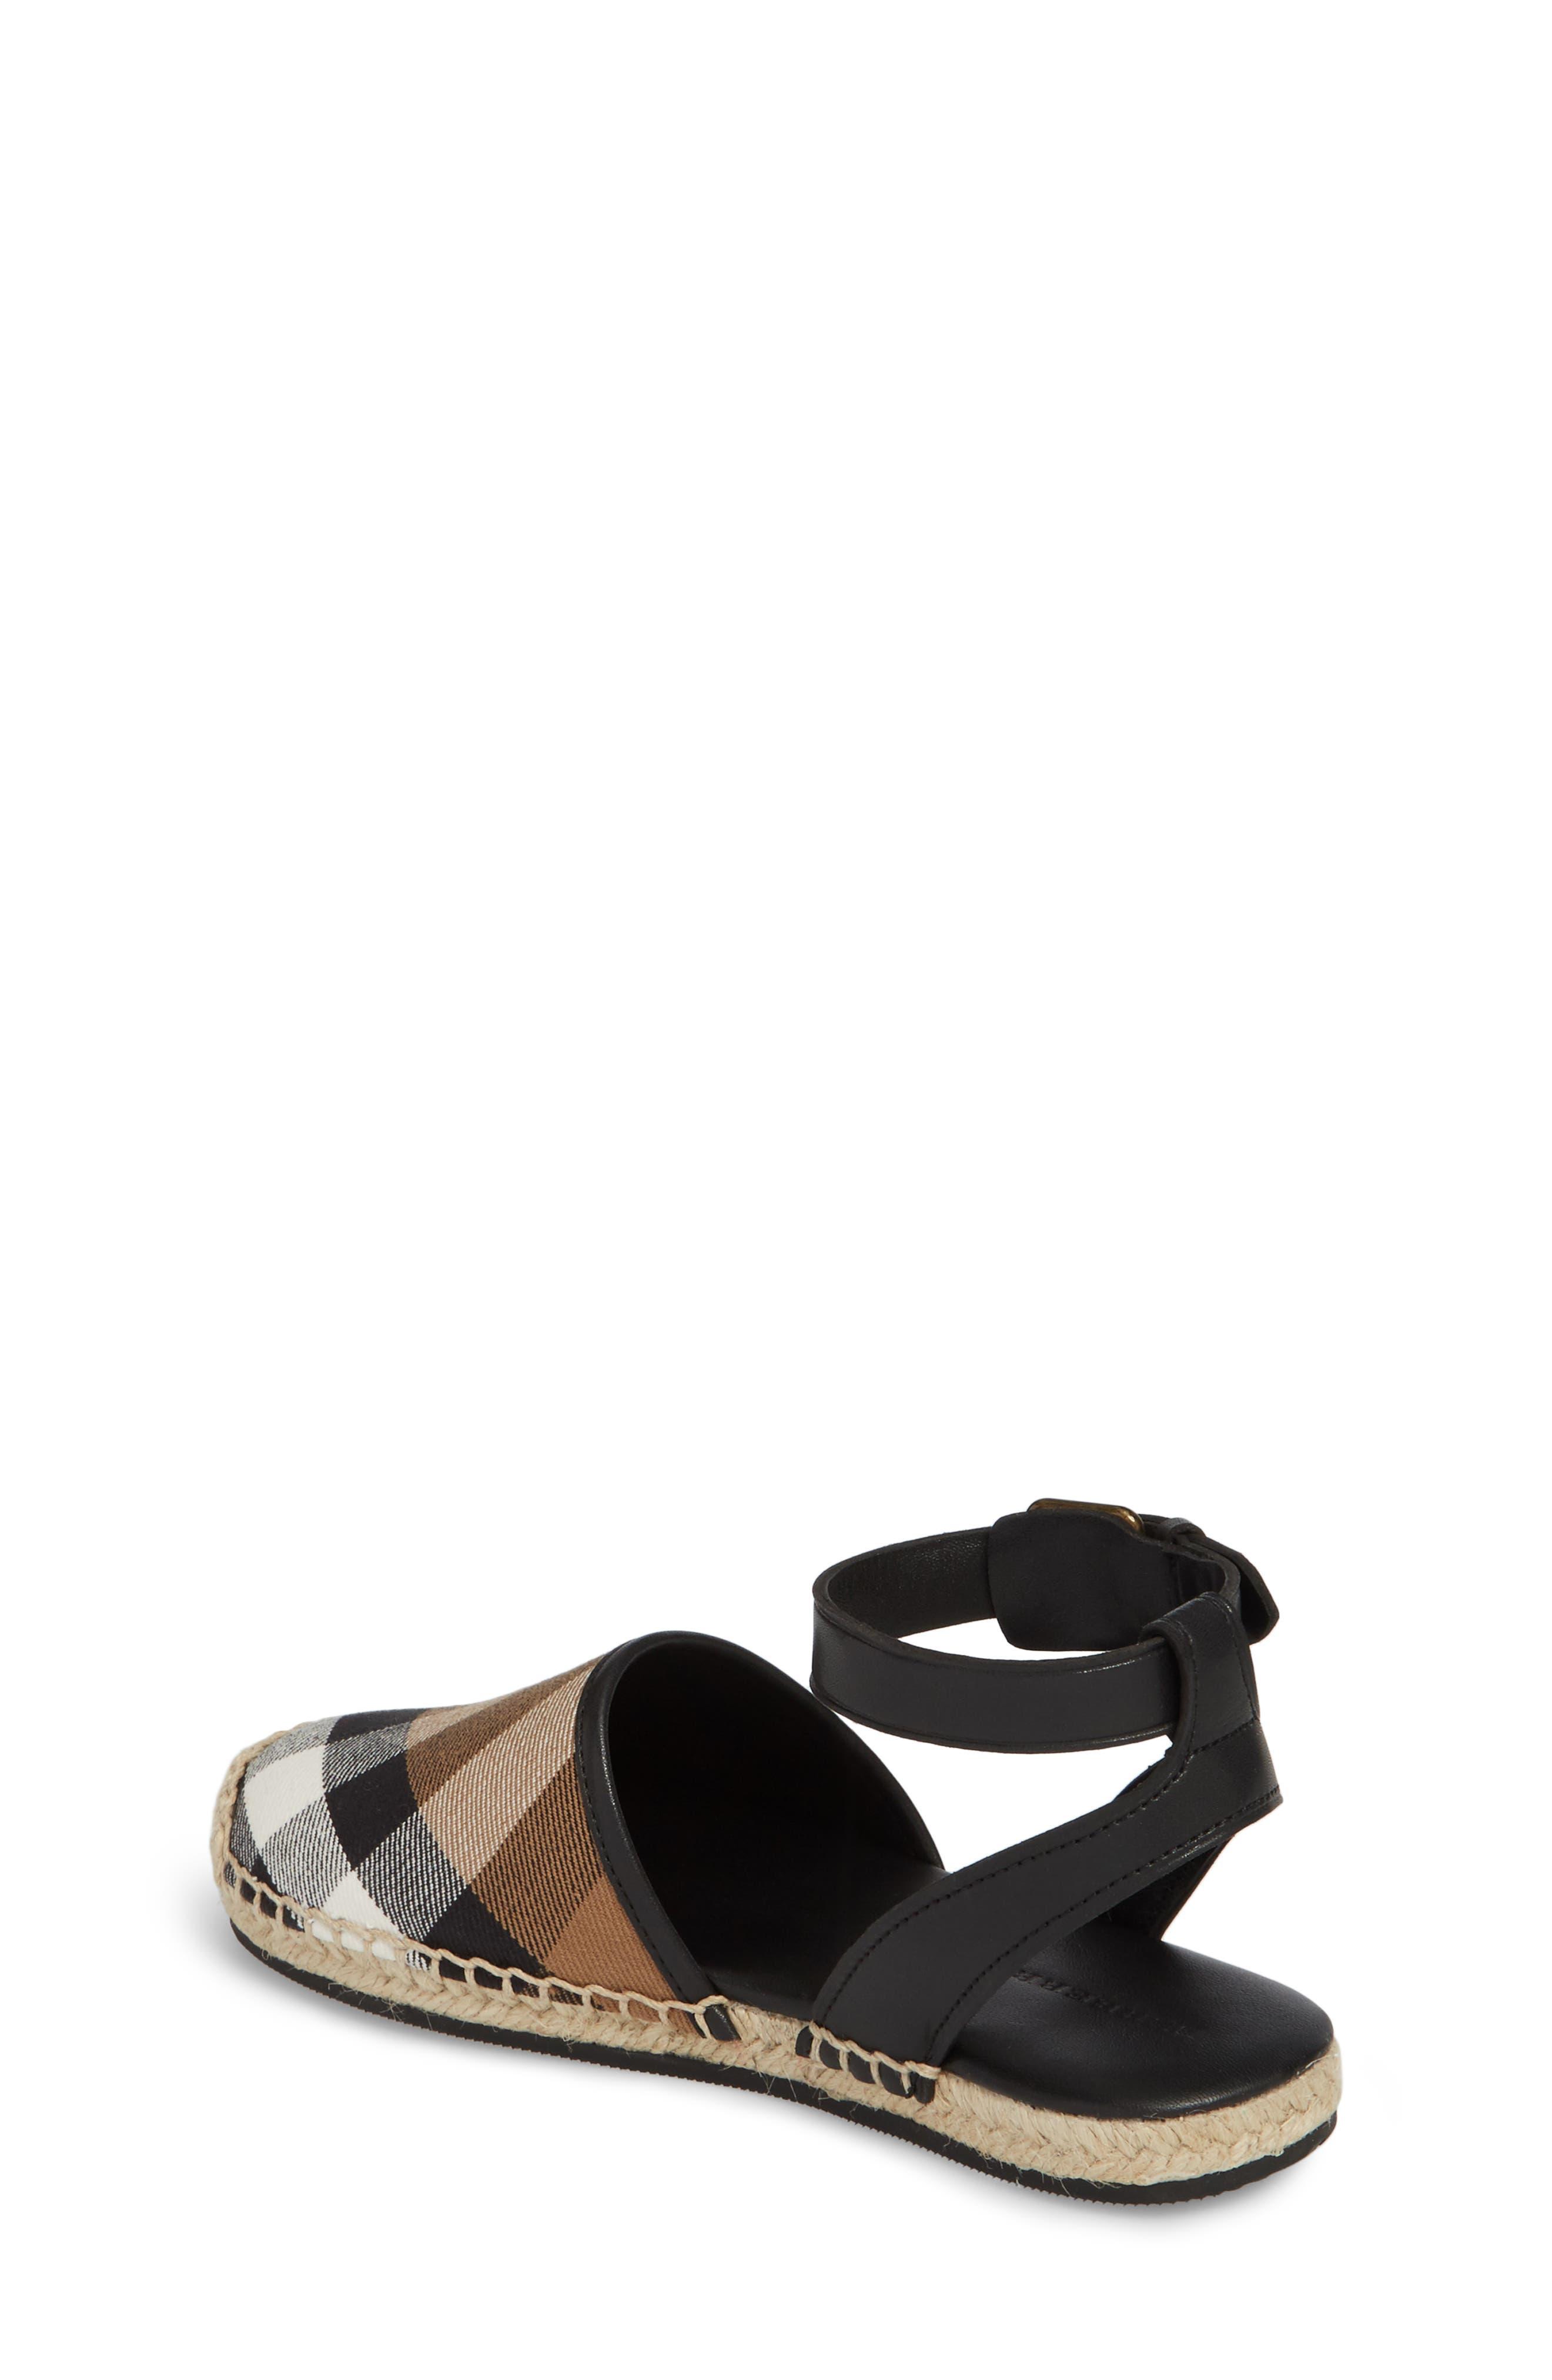 Perth Ankle Strap Sandal,                             Alternate thumbnail 2, color,                             BLACK